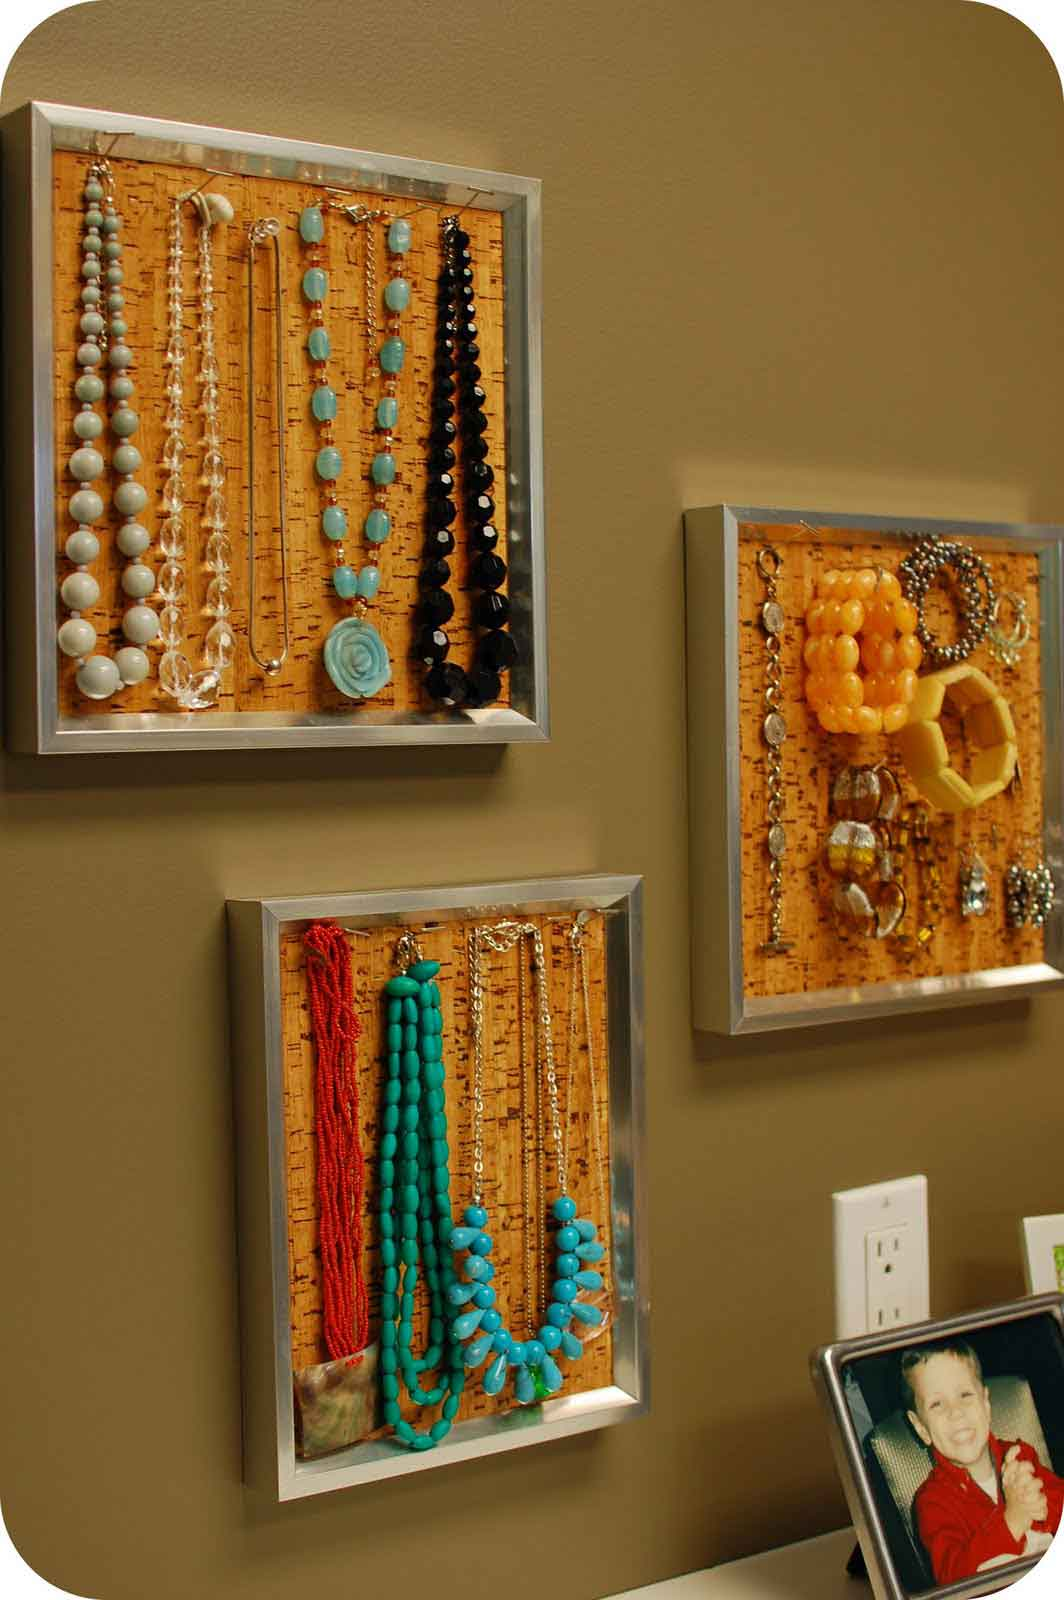 bulletin board design office cork boards for office artistic fabric cork board for jewelries bulletin board designs for office